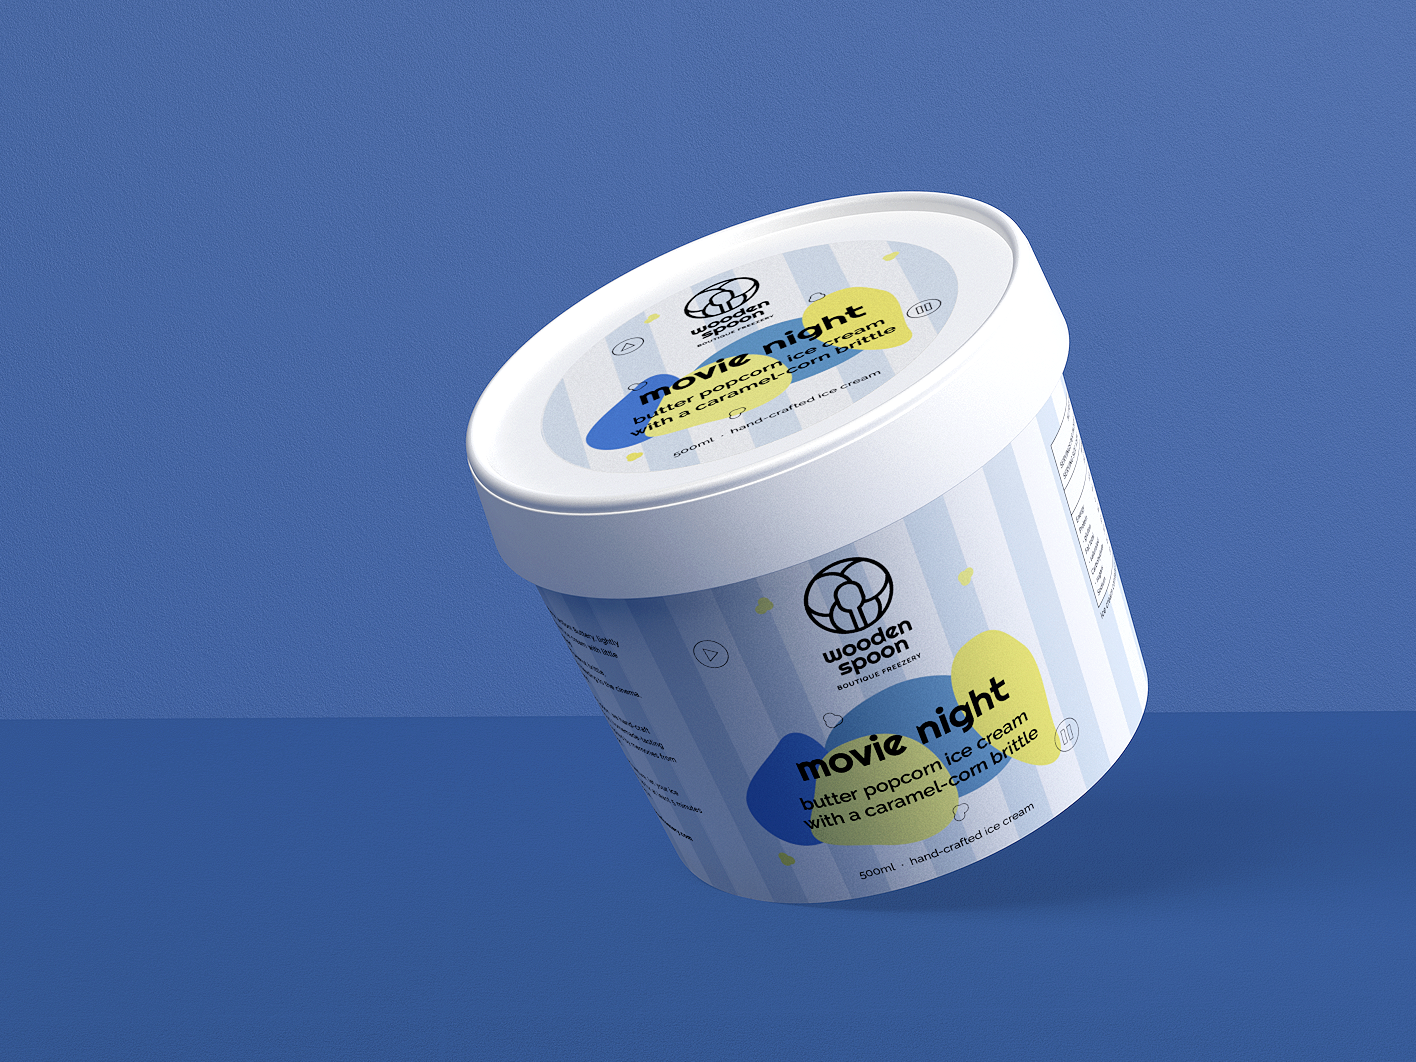 Ice Cream packaging packaging cinema4d 3d art 3d daily branding design simple